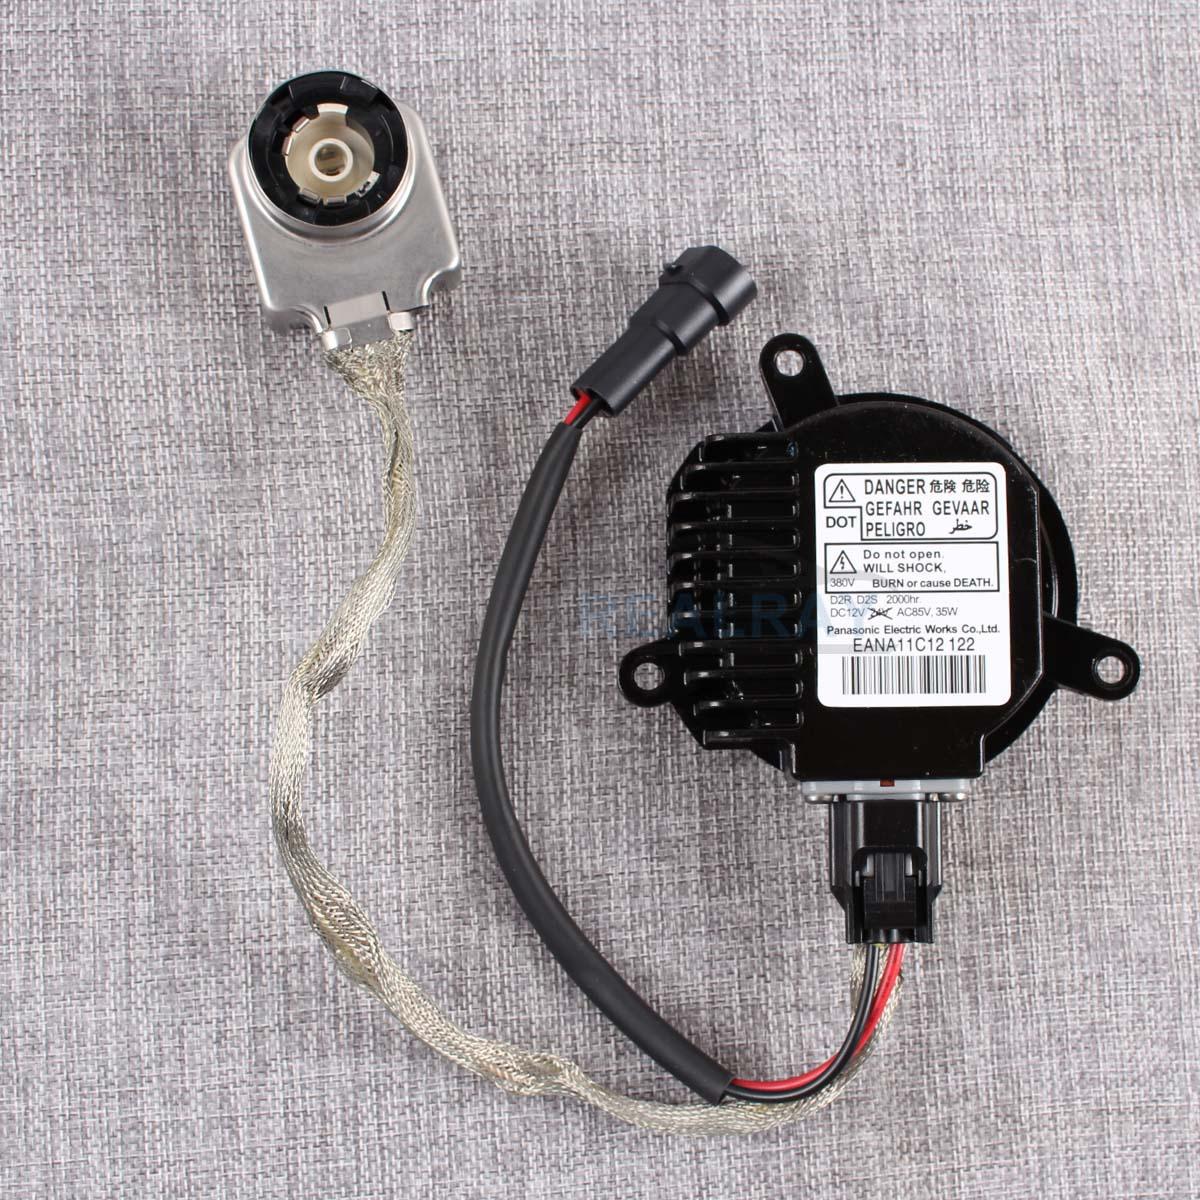 Oem Hid Xenon Headlight Ballast Igniter Bulb For Infiniti